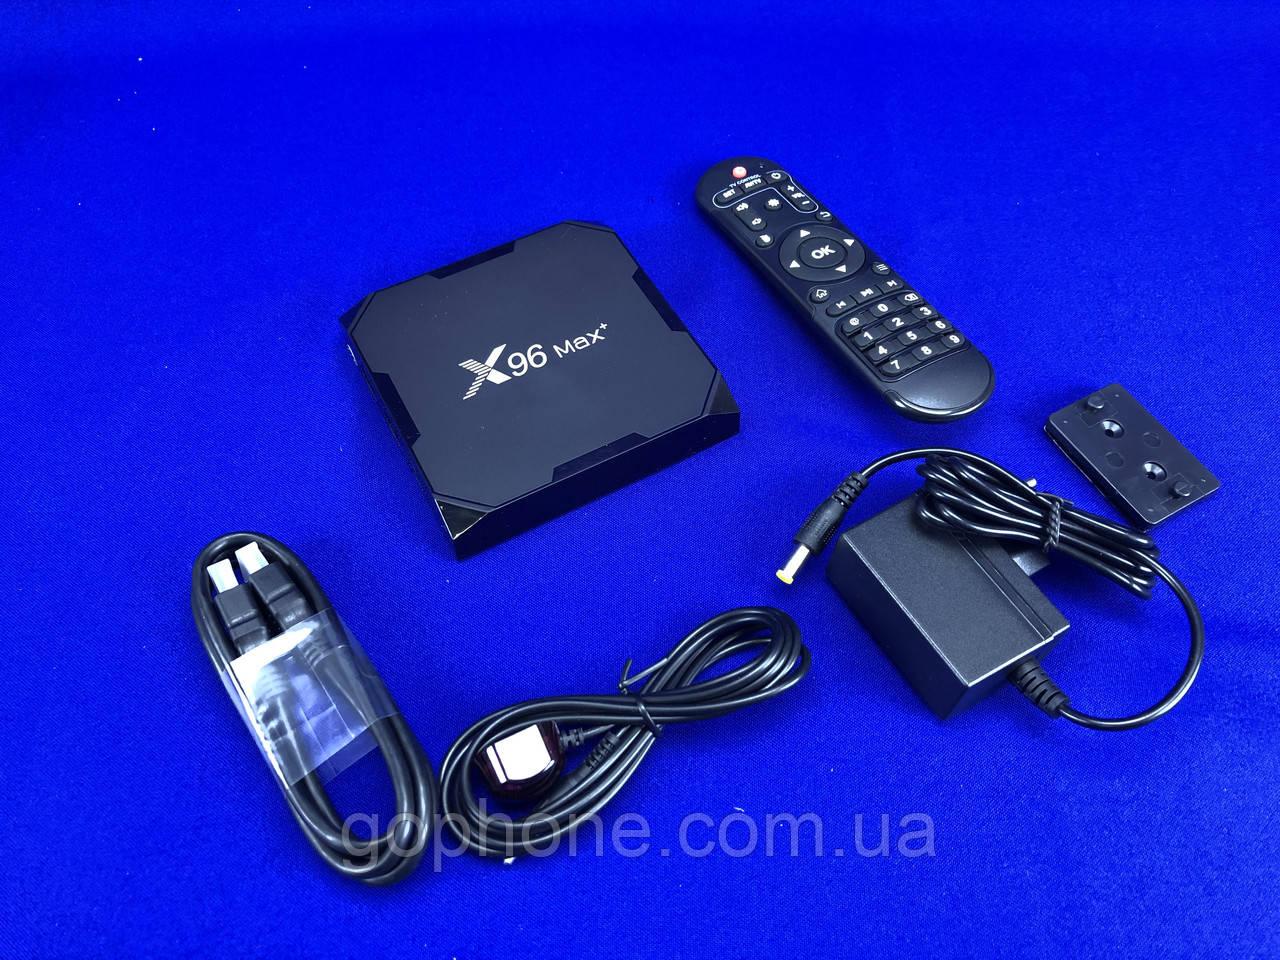 Смарт-приставка Android TV Box  X96 MAX+ 4GB + 32GB Android 9  WI FI 2,4/5,6 GHz